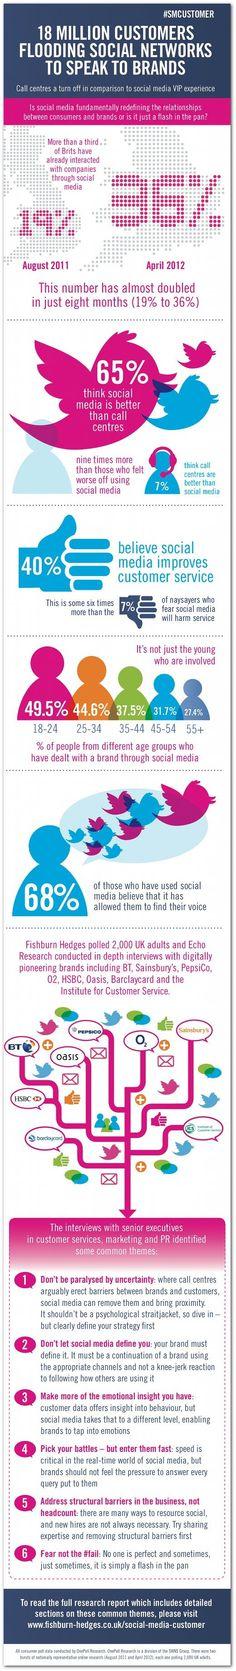 18 million customers flooding social networks to speak to brands - The Social Media Customer [infographic] Power Of Social Media, Social Media Tips, Social Networks, Social Media Branding, Social Media Marketing, Customer Service Articles, Internet Marketing, Online Marketing, Google Plus